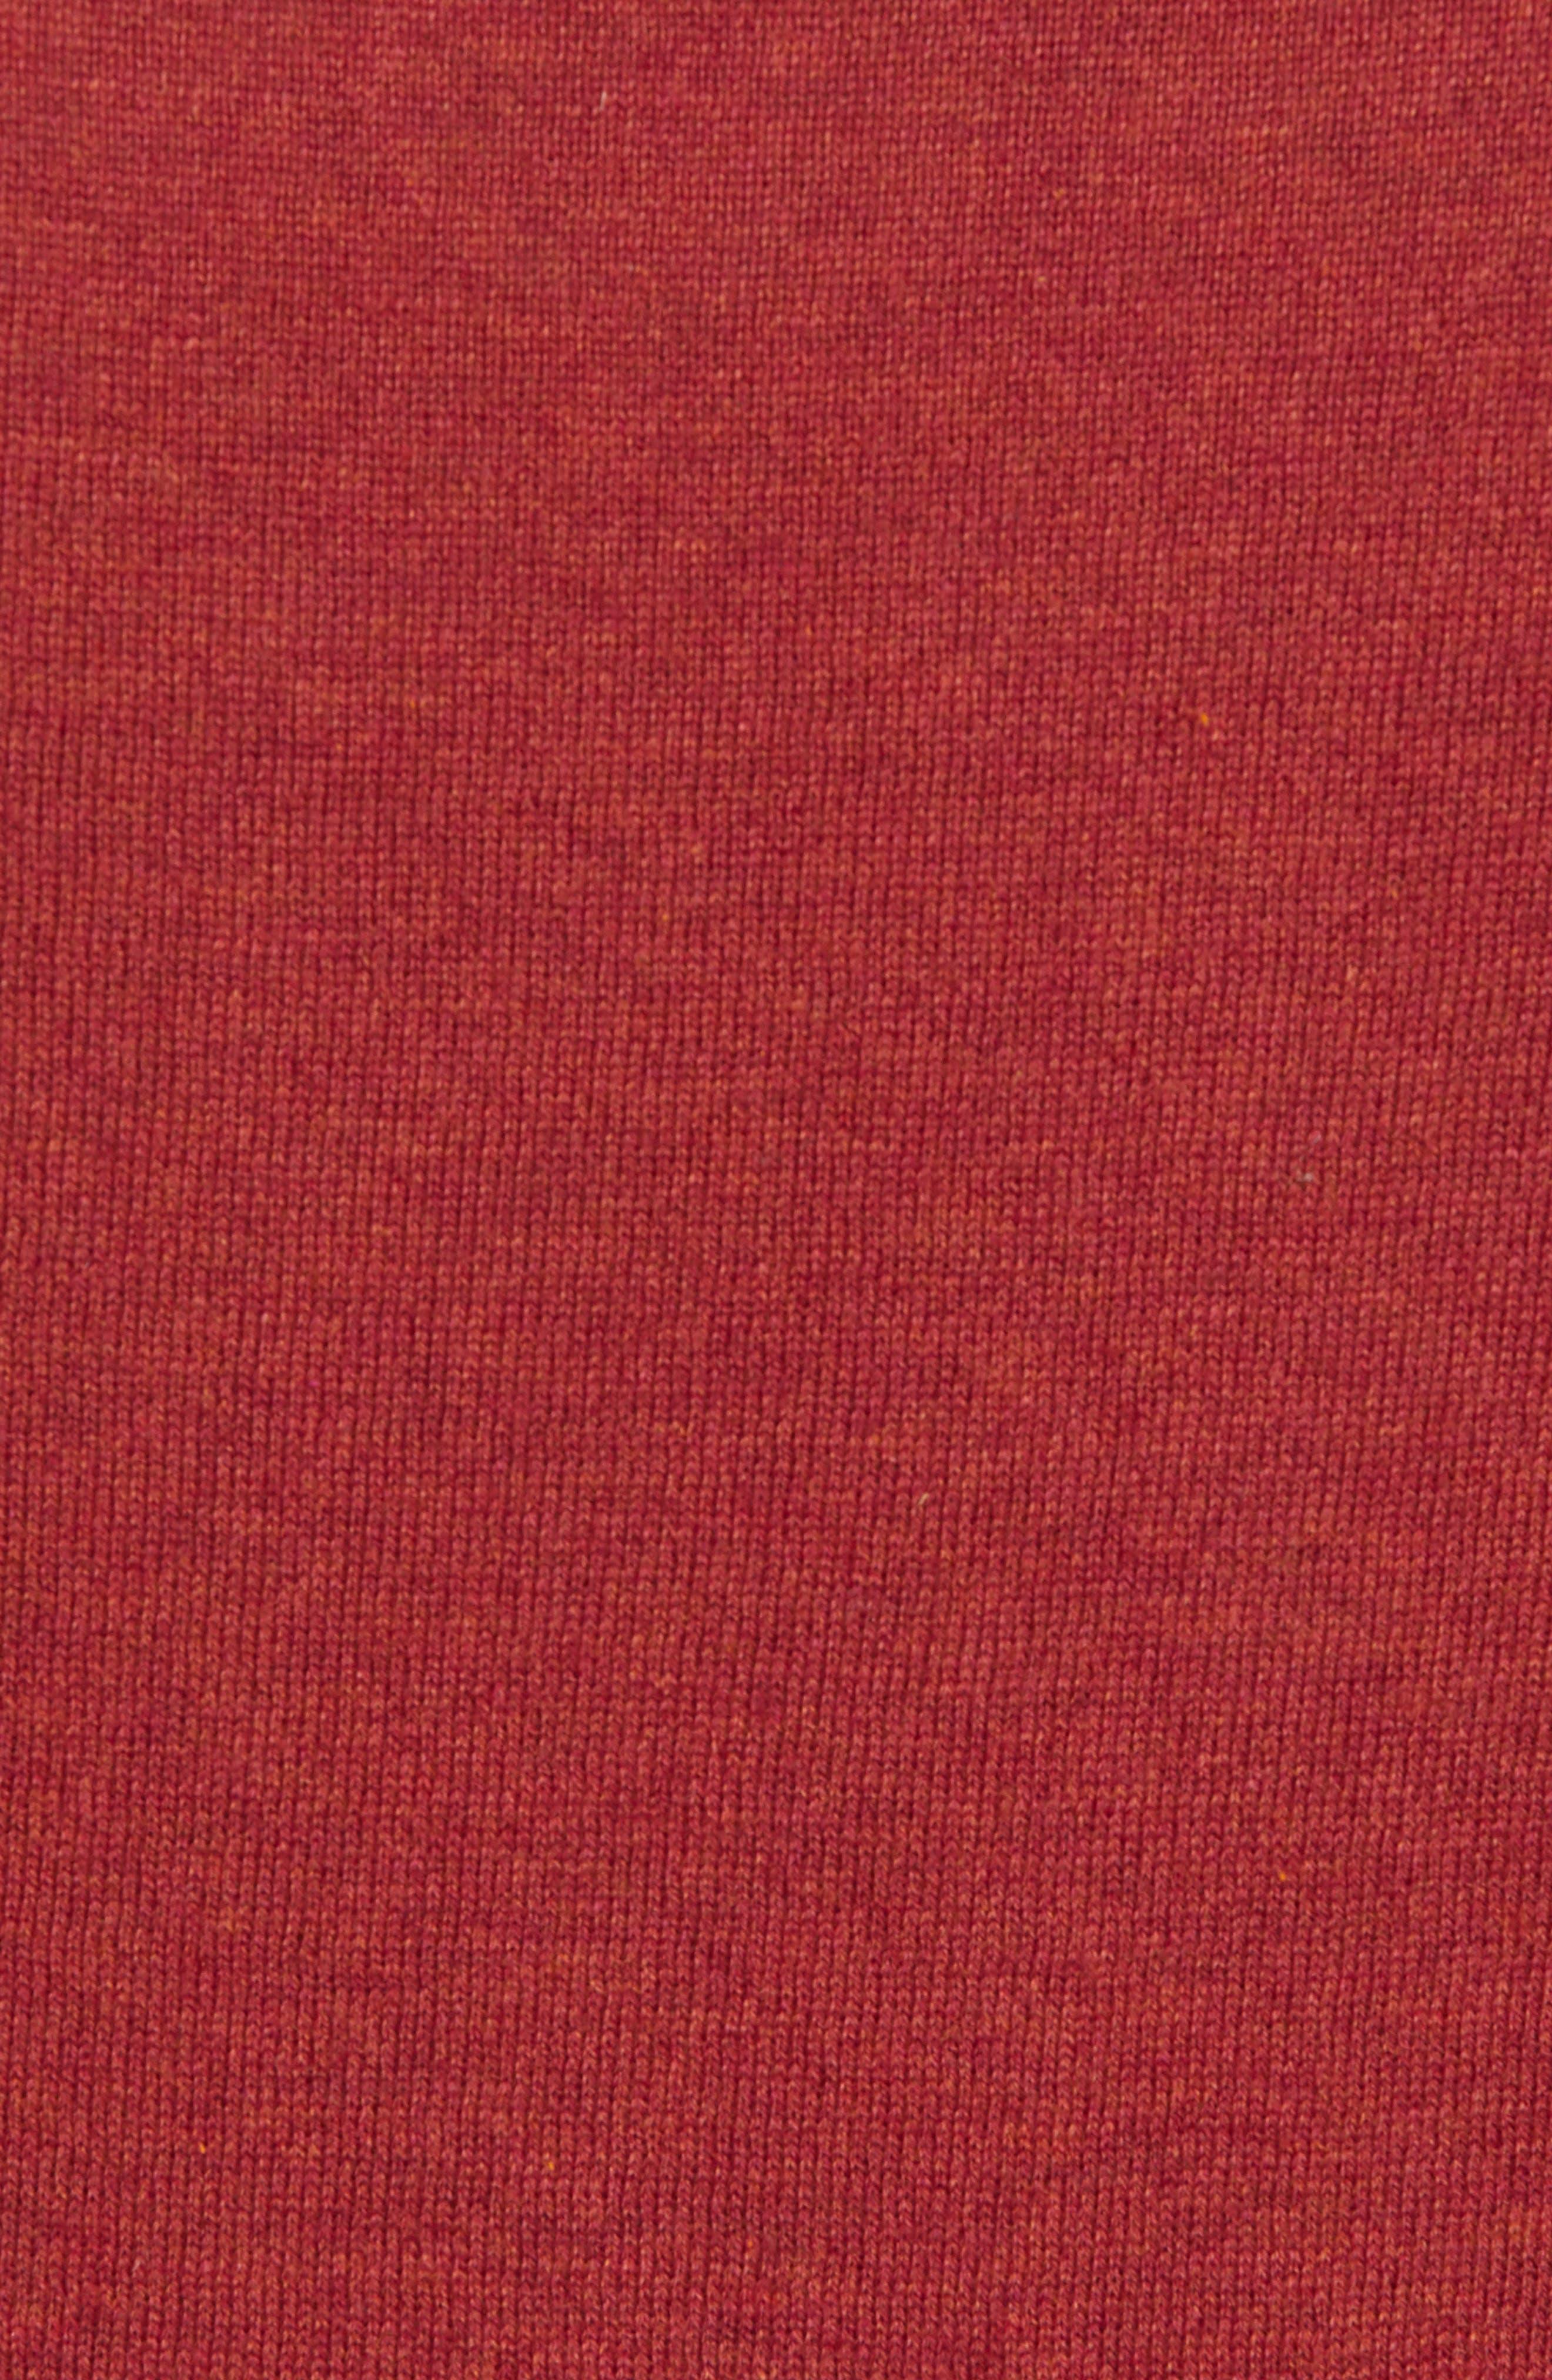 Turtleneck Sweater,                             Alternate thumbnail 5, color,                             610